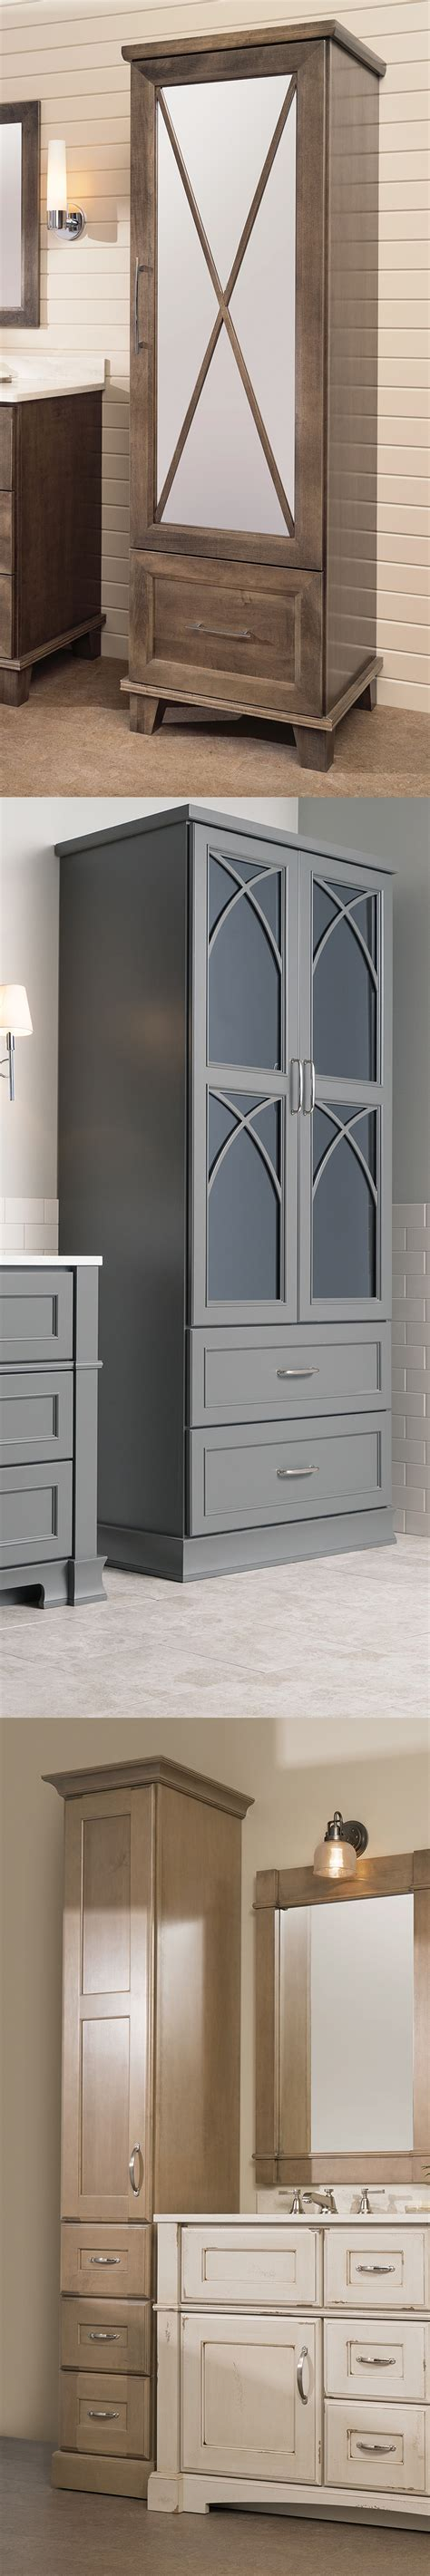 Linen Armoire Storage by Bathroom Furniture Makes Linen Storage Stylish